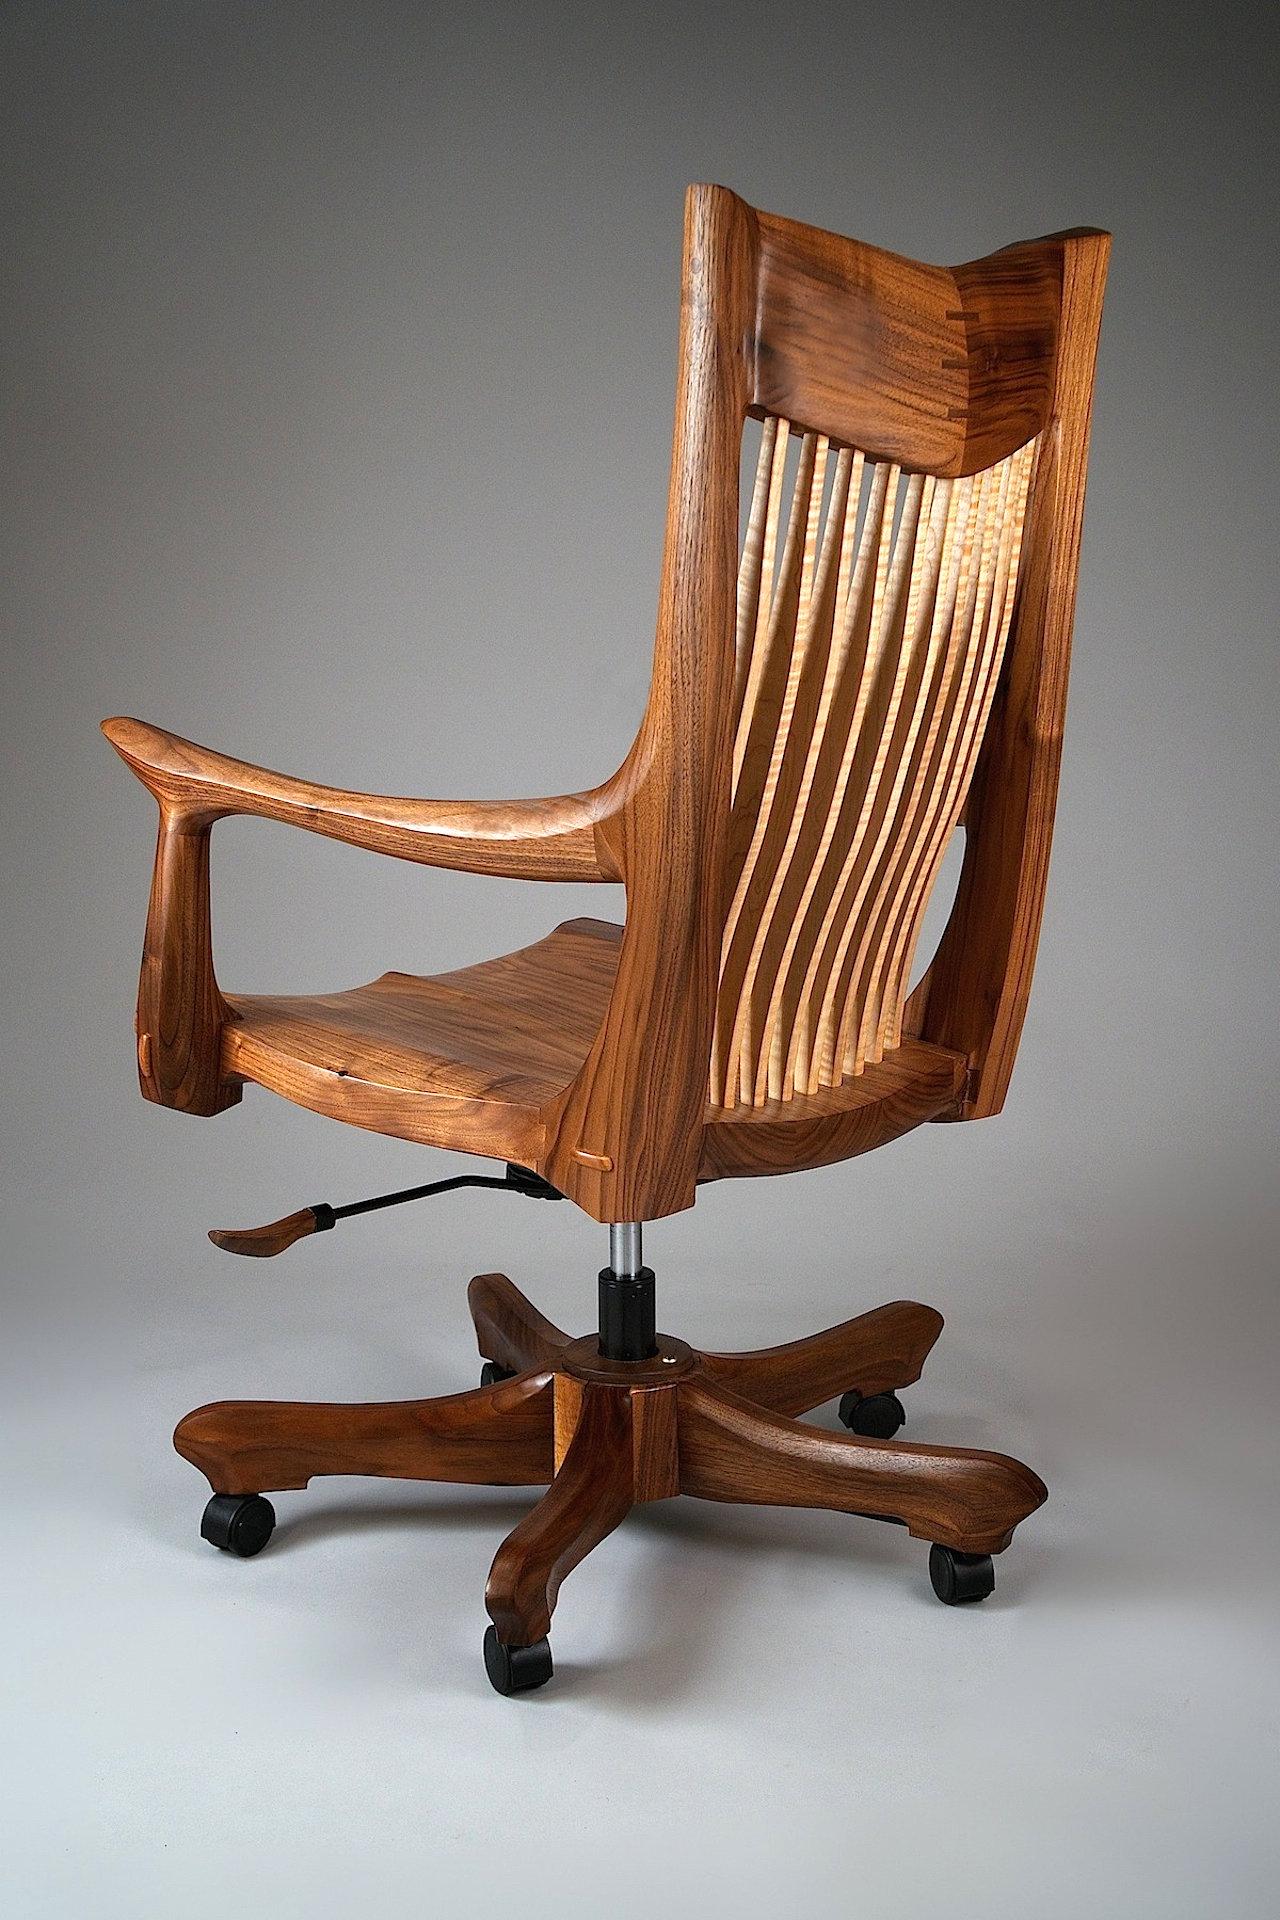 Franklin Swivel Desk Chair By Richard Laufer Wood Chair Artful Home